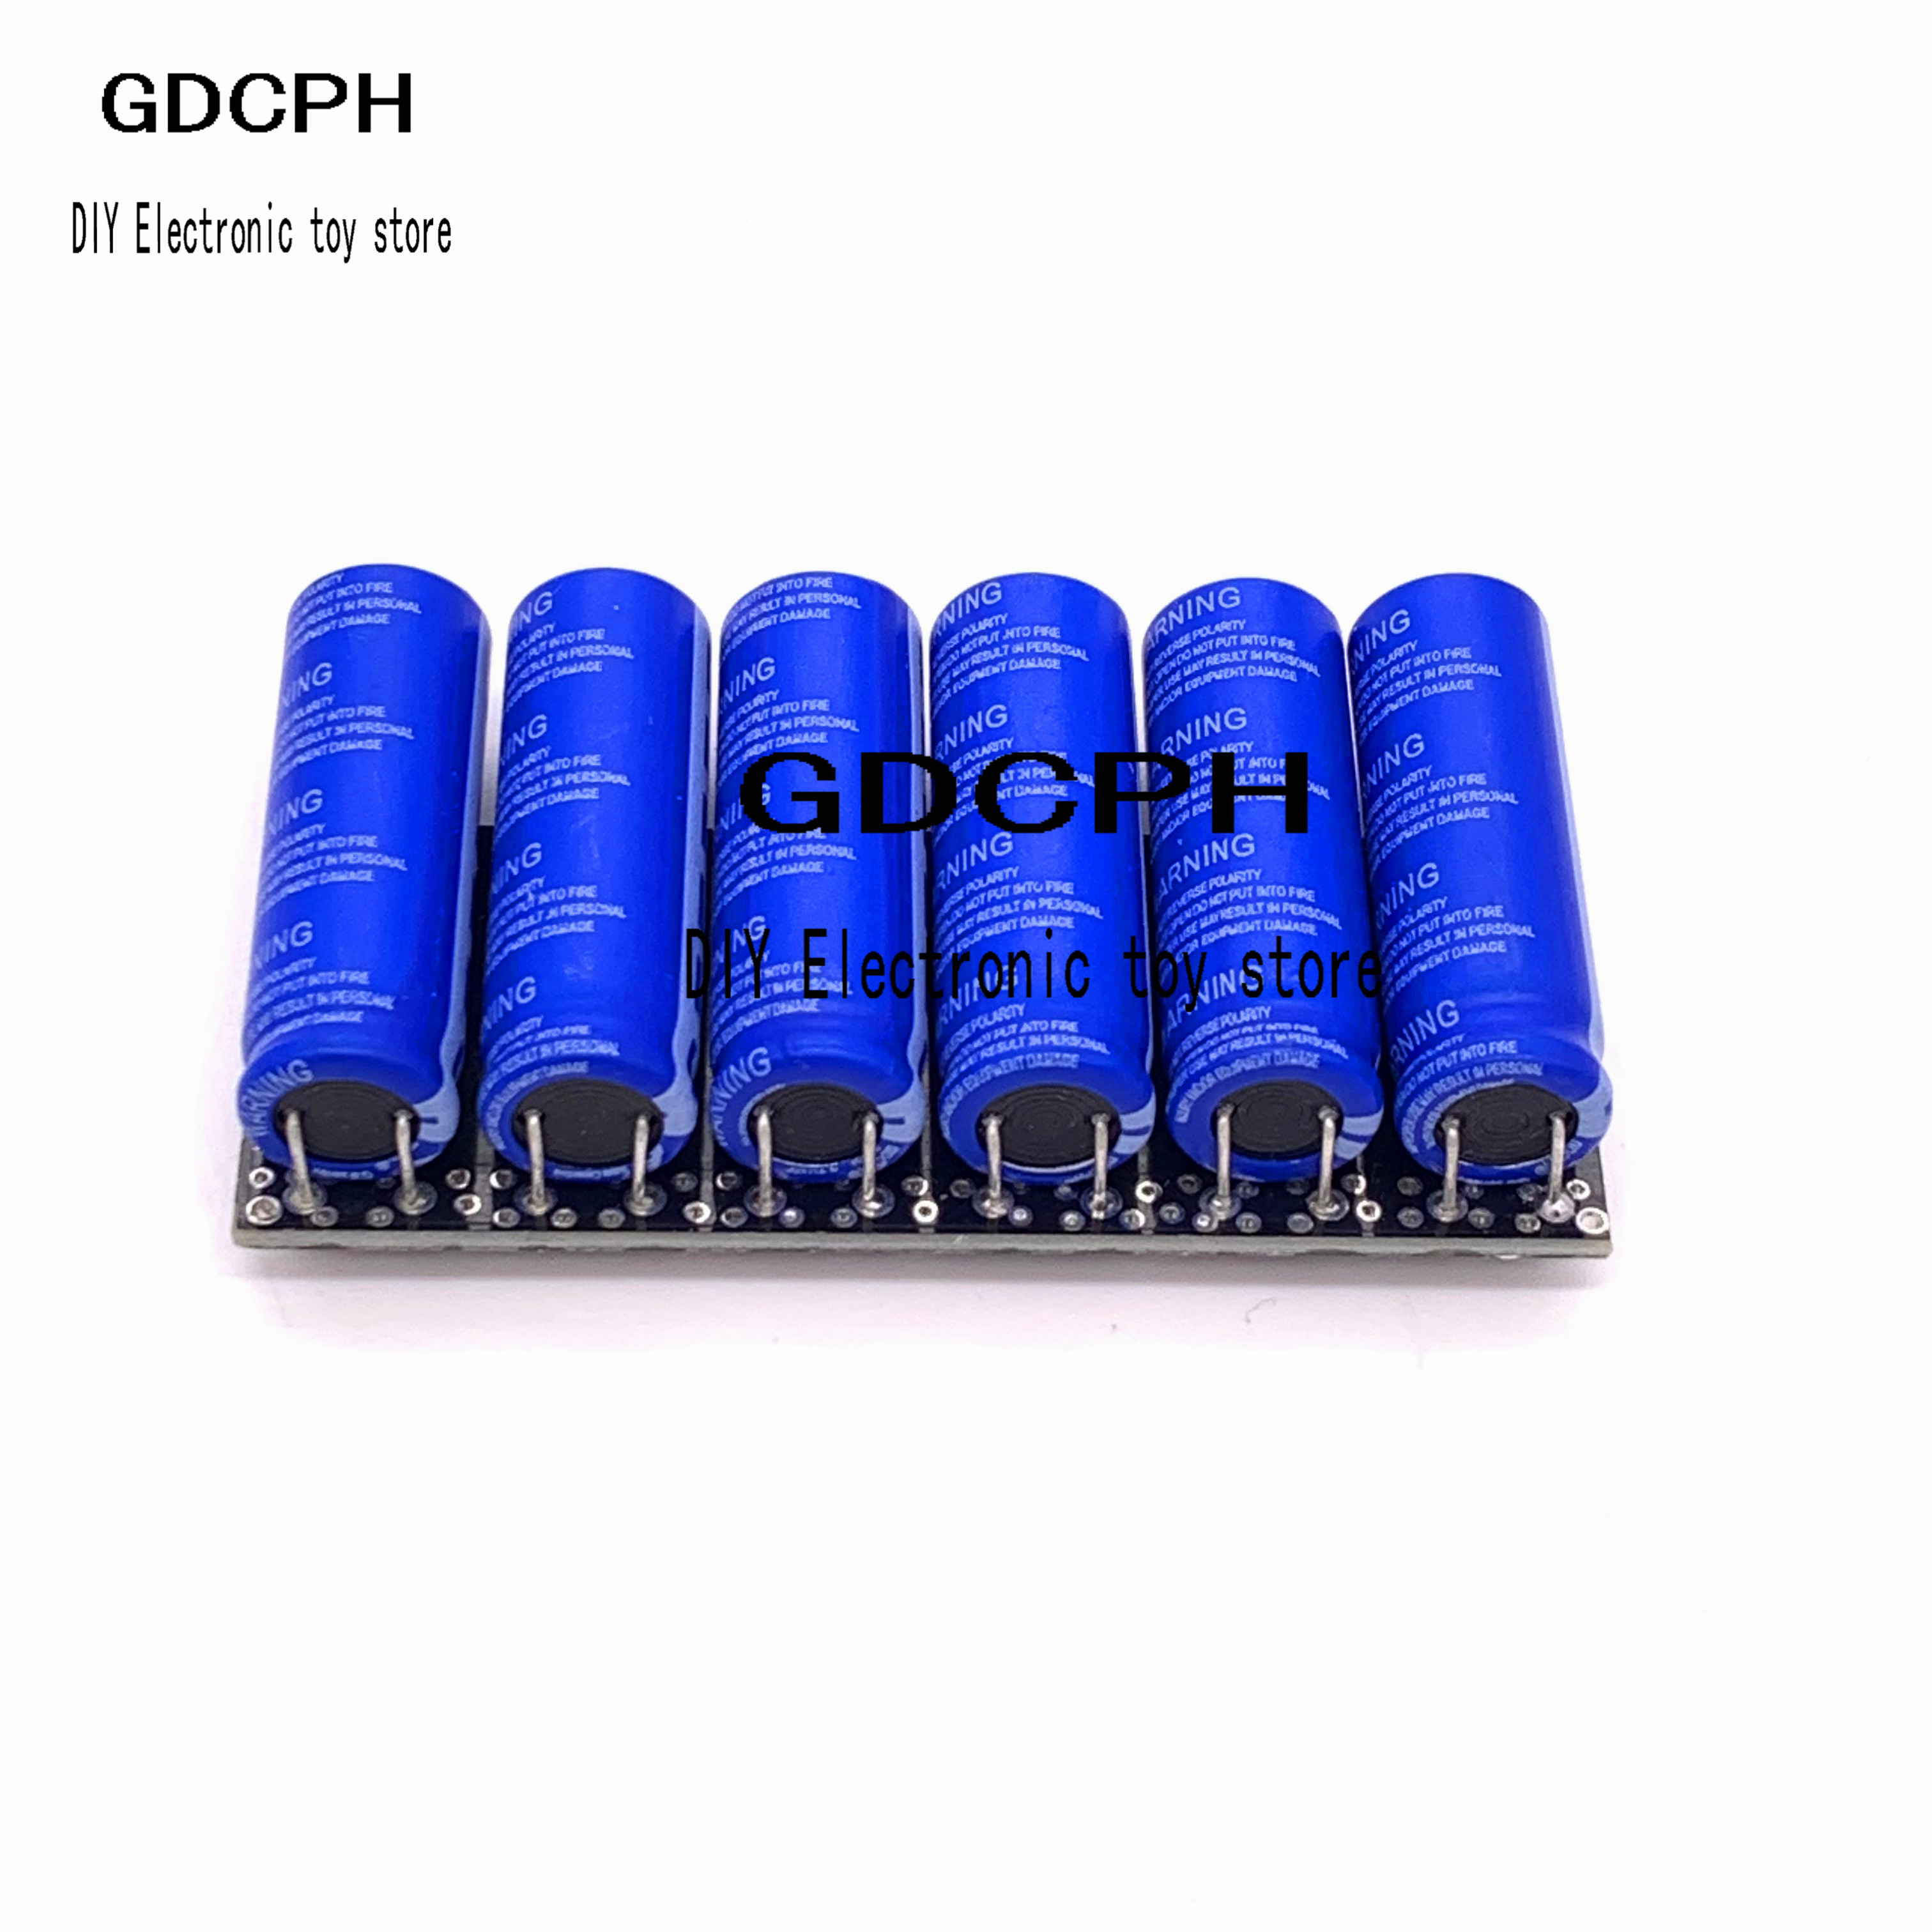 Farad Capacitor 6pcs / Group 16V1.6F Super Capacitor 2.7V10F 16V1F 16V2F Backup Power Battery